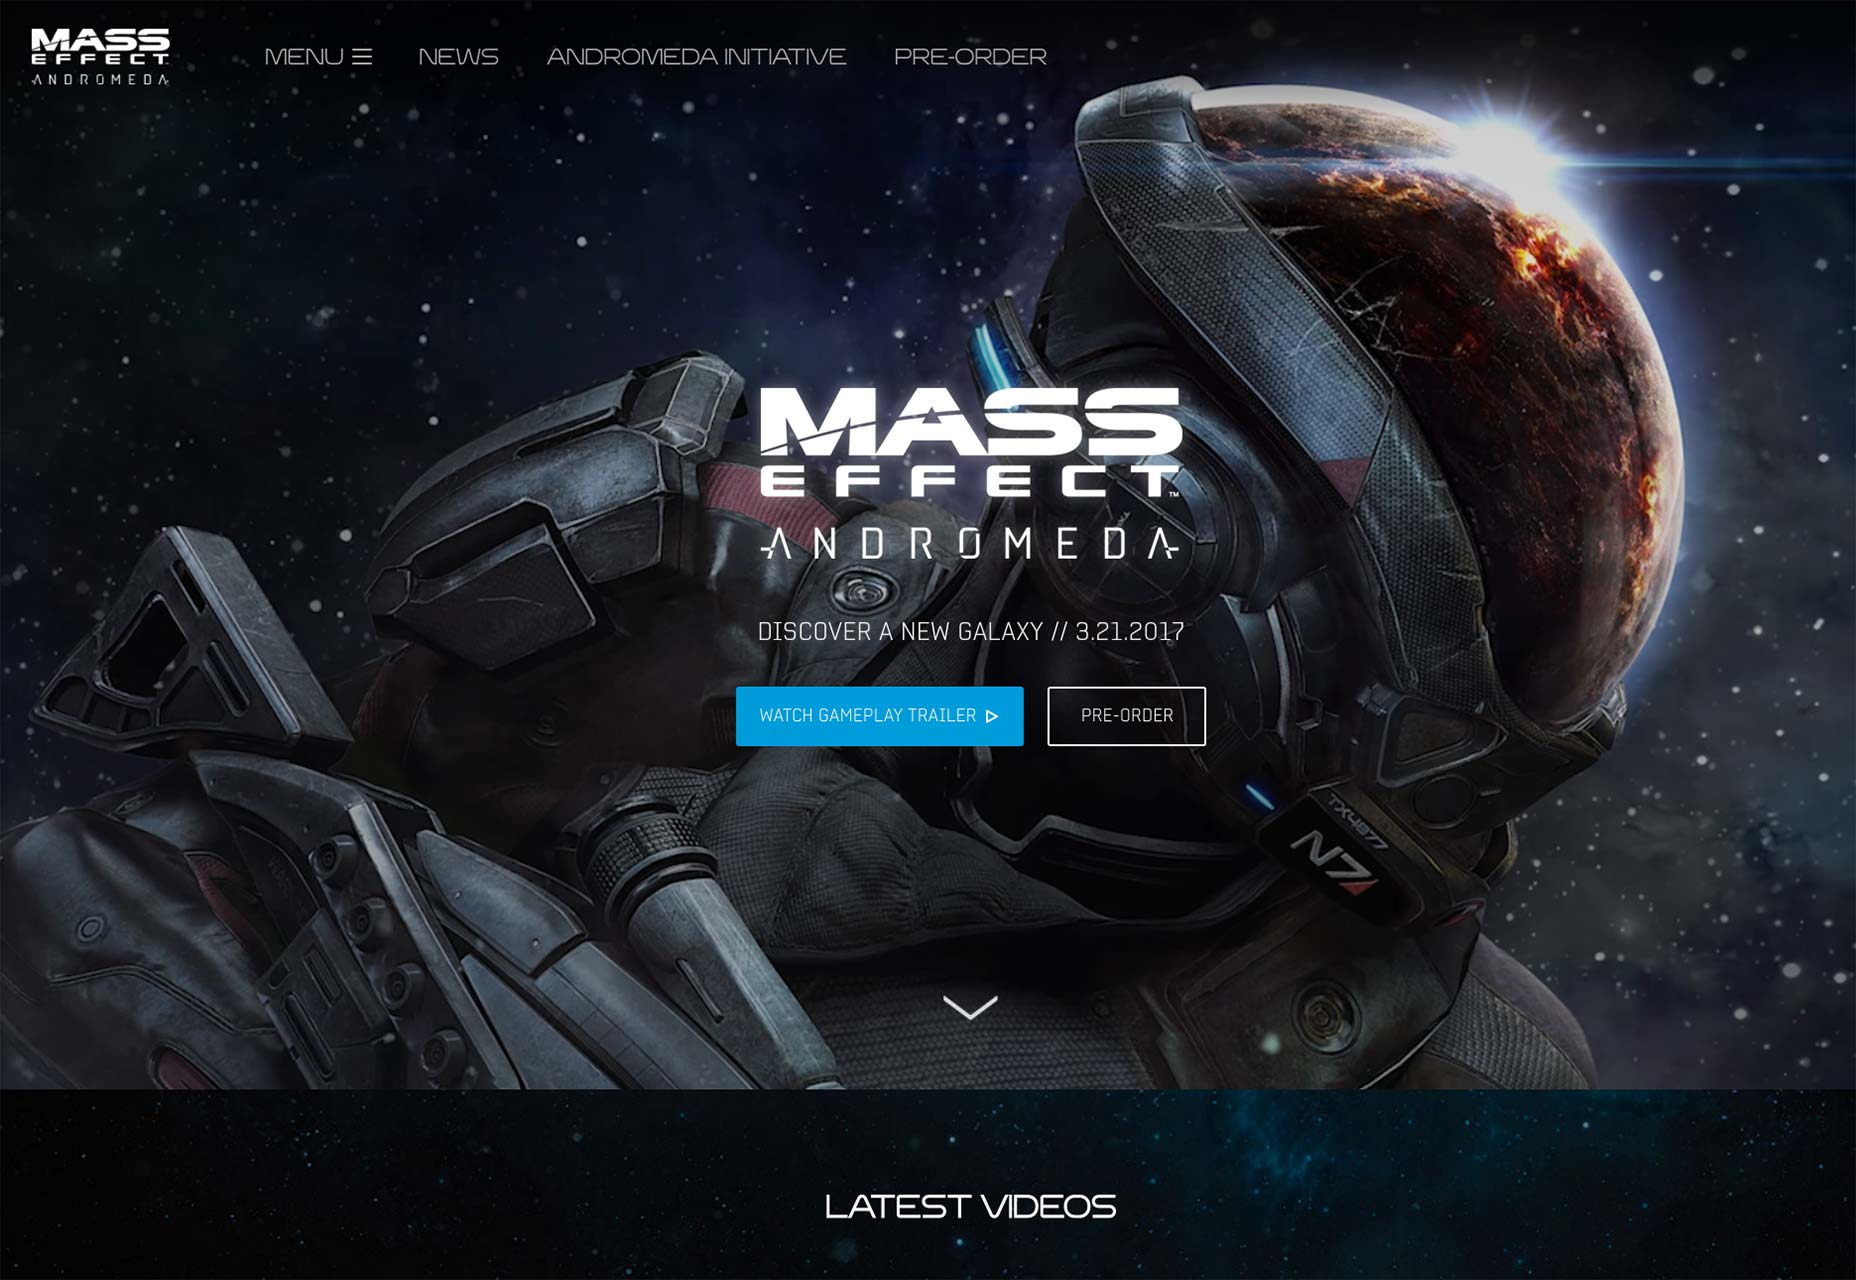 massa-effect